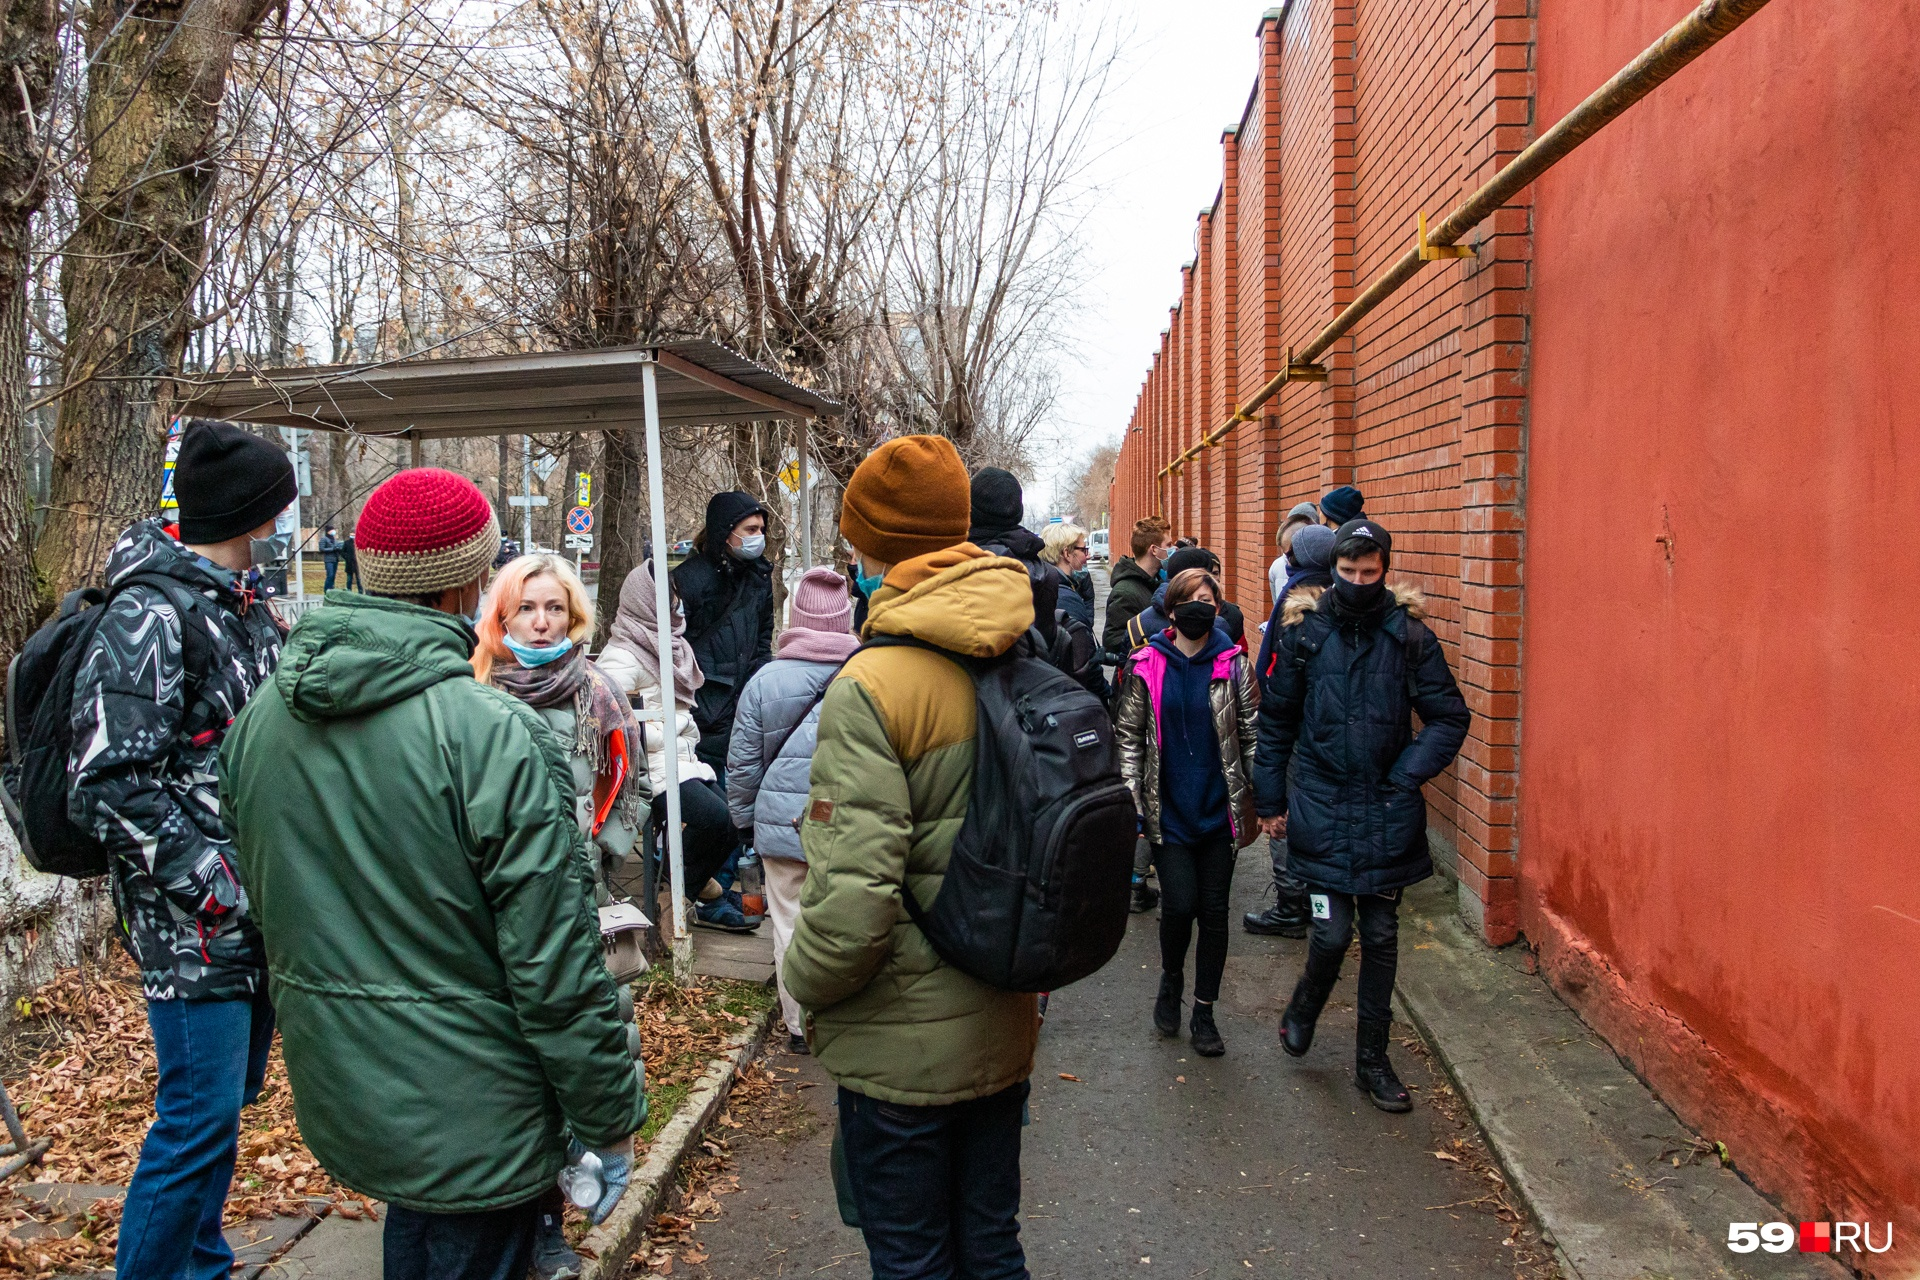 Товарищи и просто сочувствующие пермяки ждали Александра перед зданием СИЗО